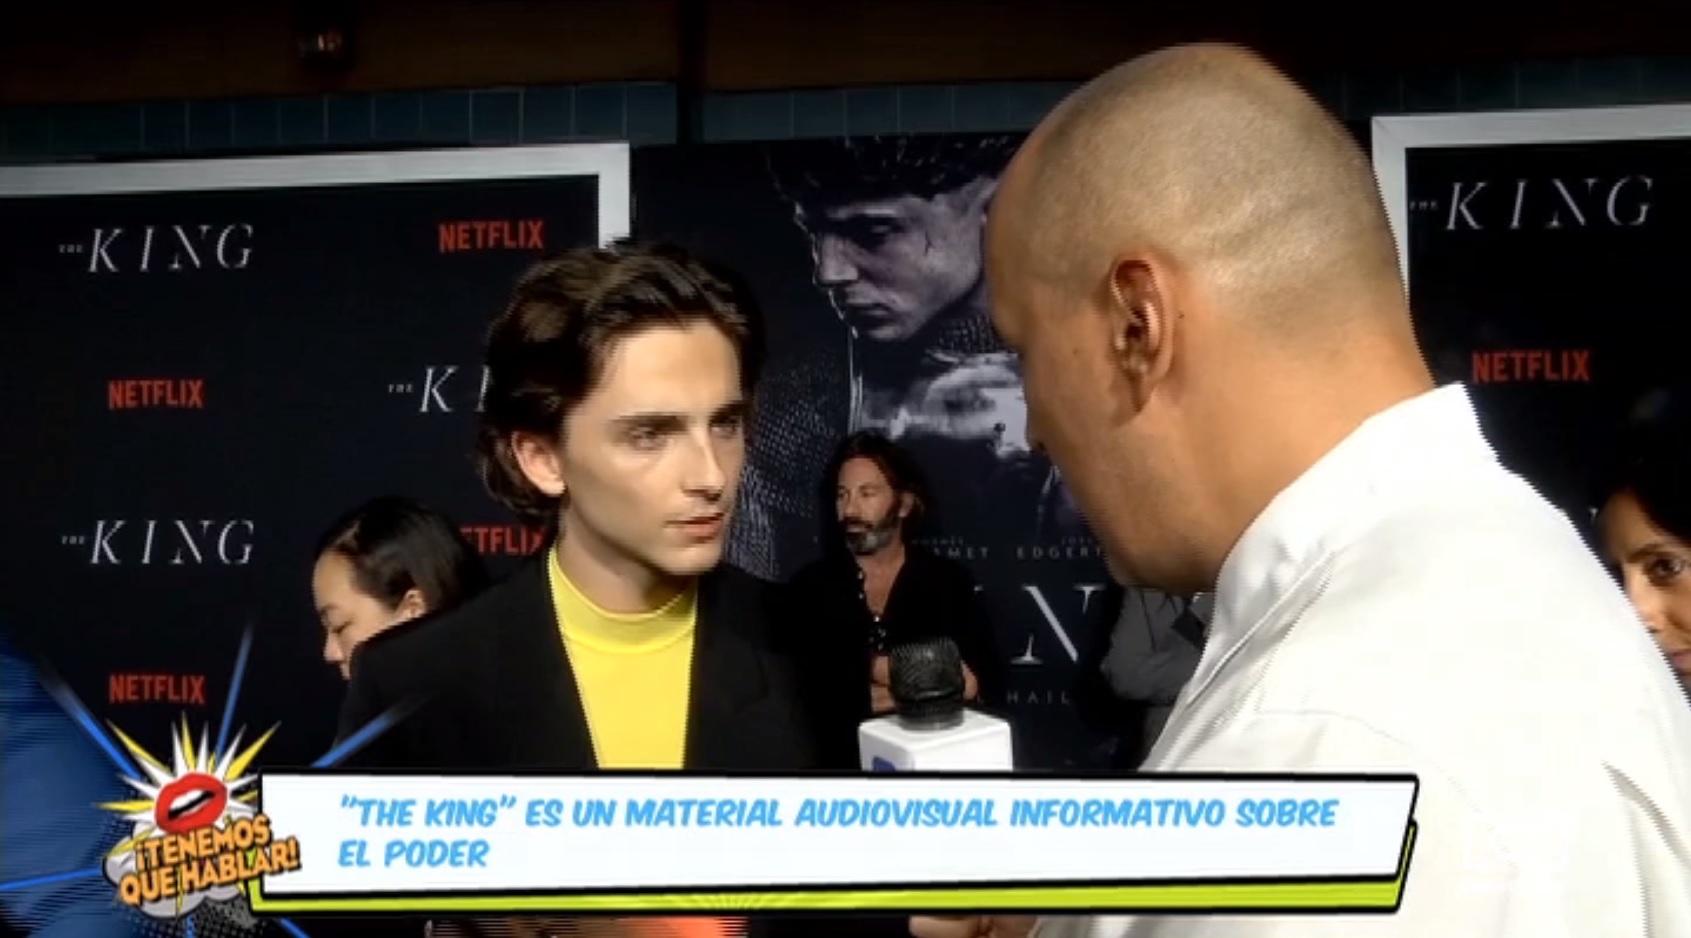 'The King', el nuevo proyecto de Timothée Chalamet, ingresará al catalogó de Netflix